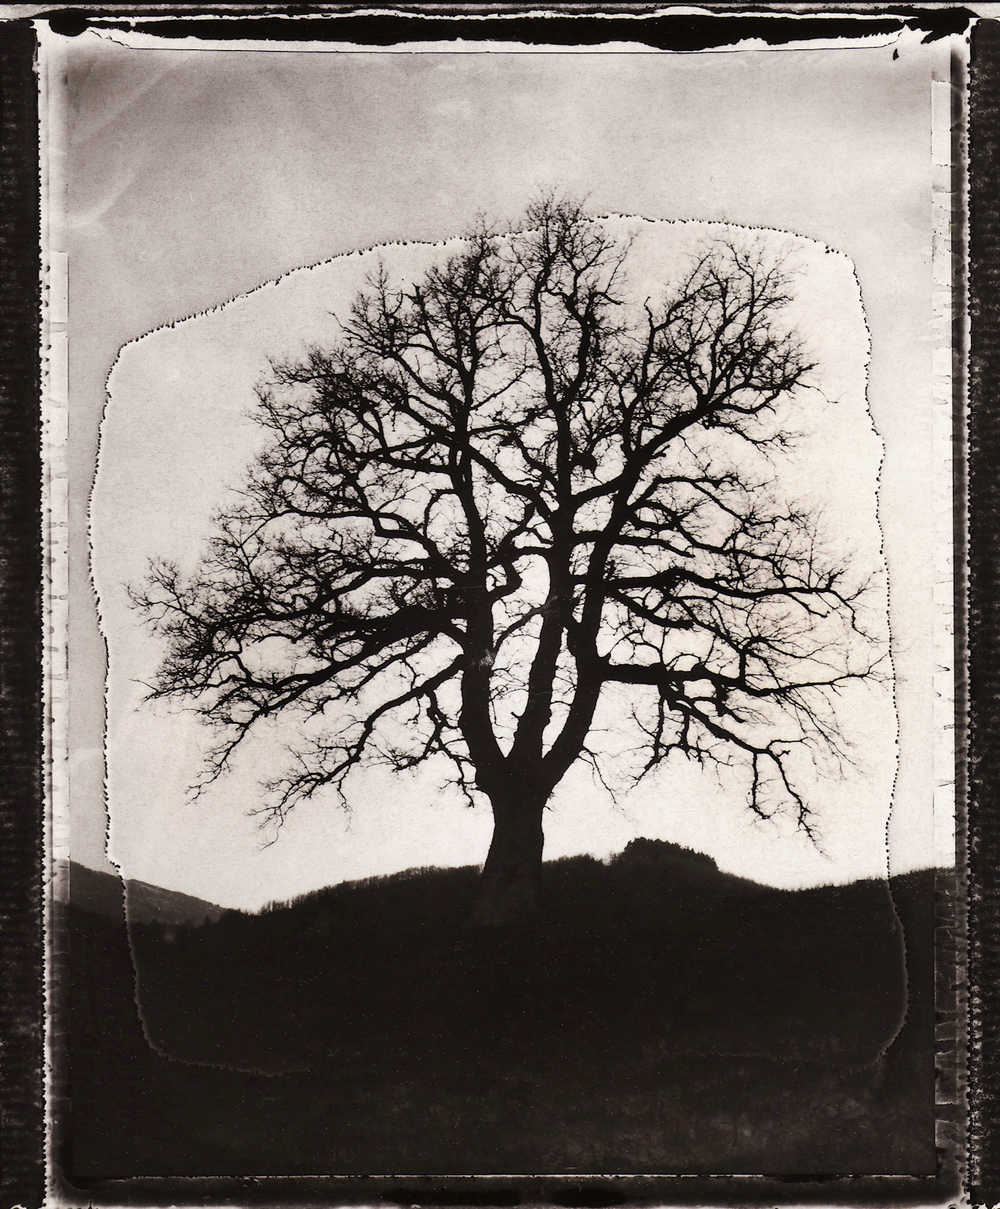 Pola-arbre 10.jpg